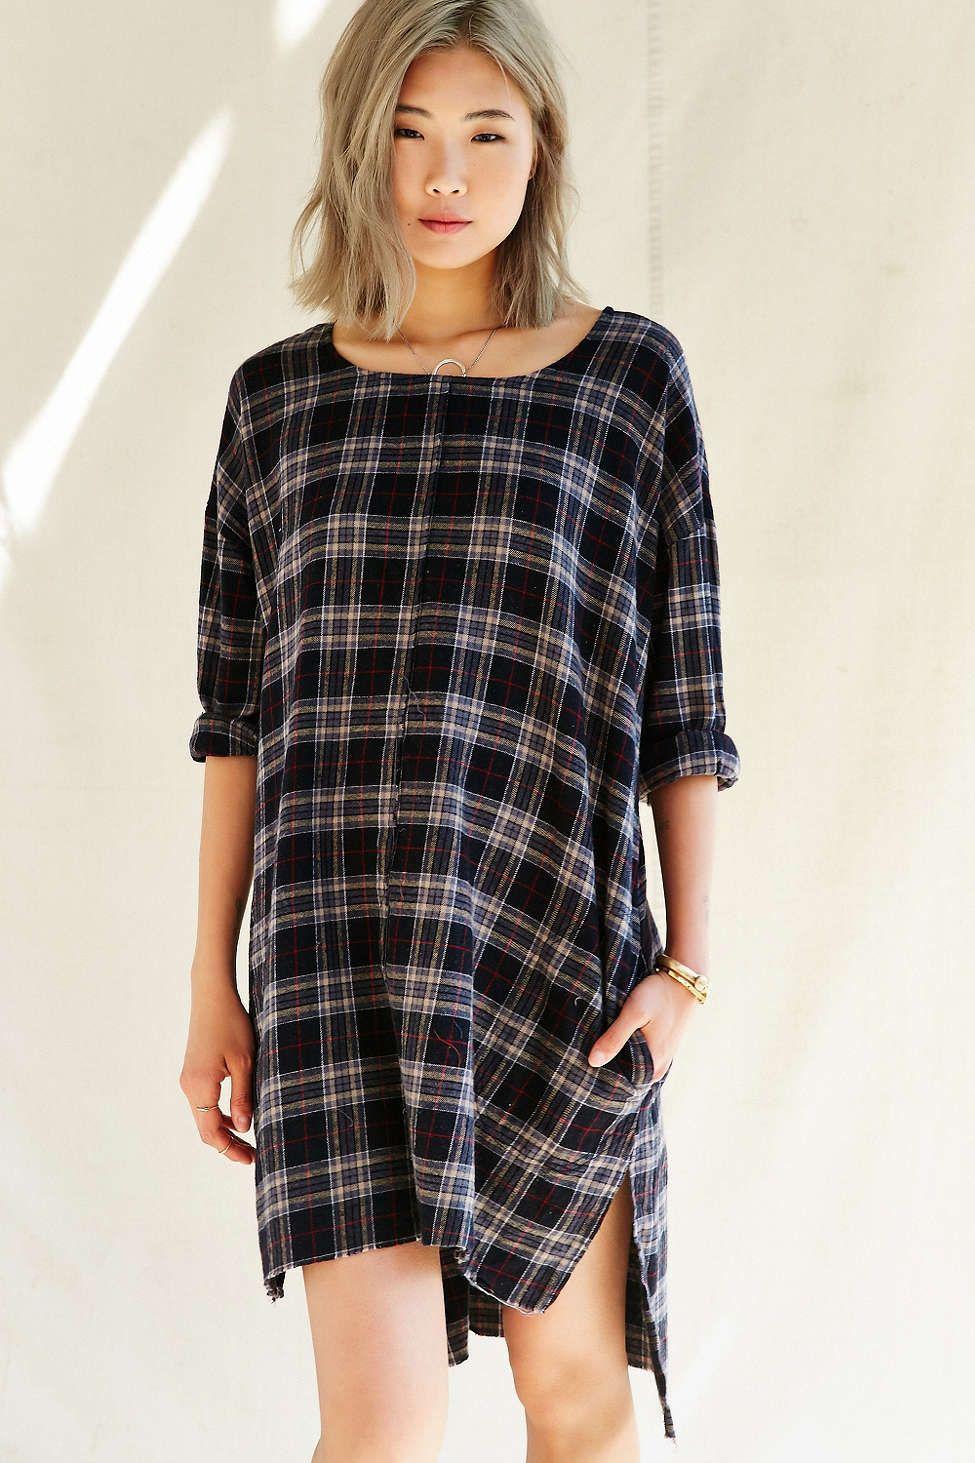 Urban Renewal Remade Plaid Flannel Raw Edge Dress Urban Dresses Clothes Design Black Dress With Pockets [ 1463 x 975 Pixel ]